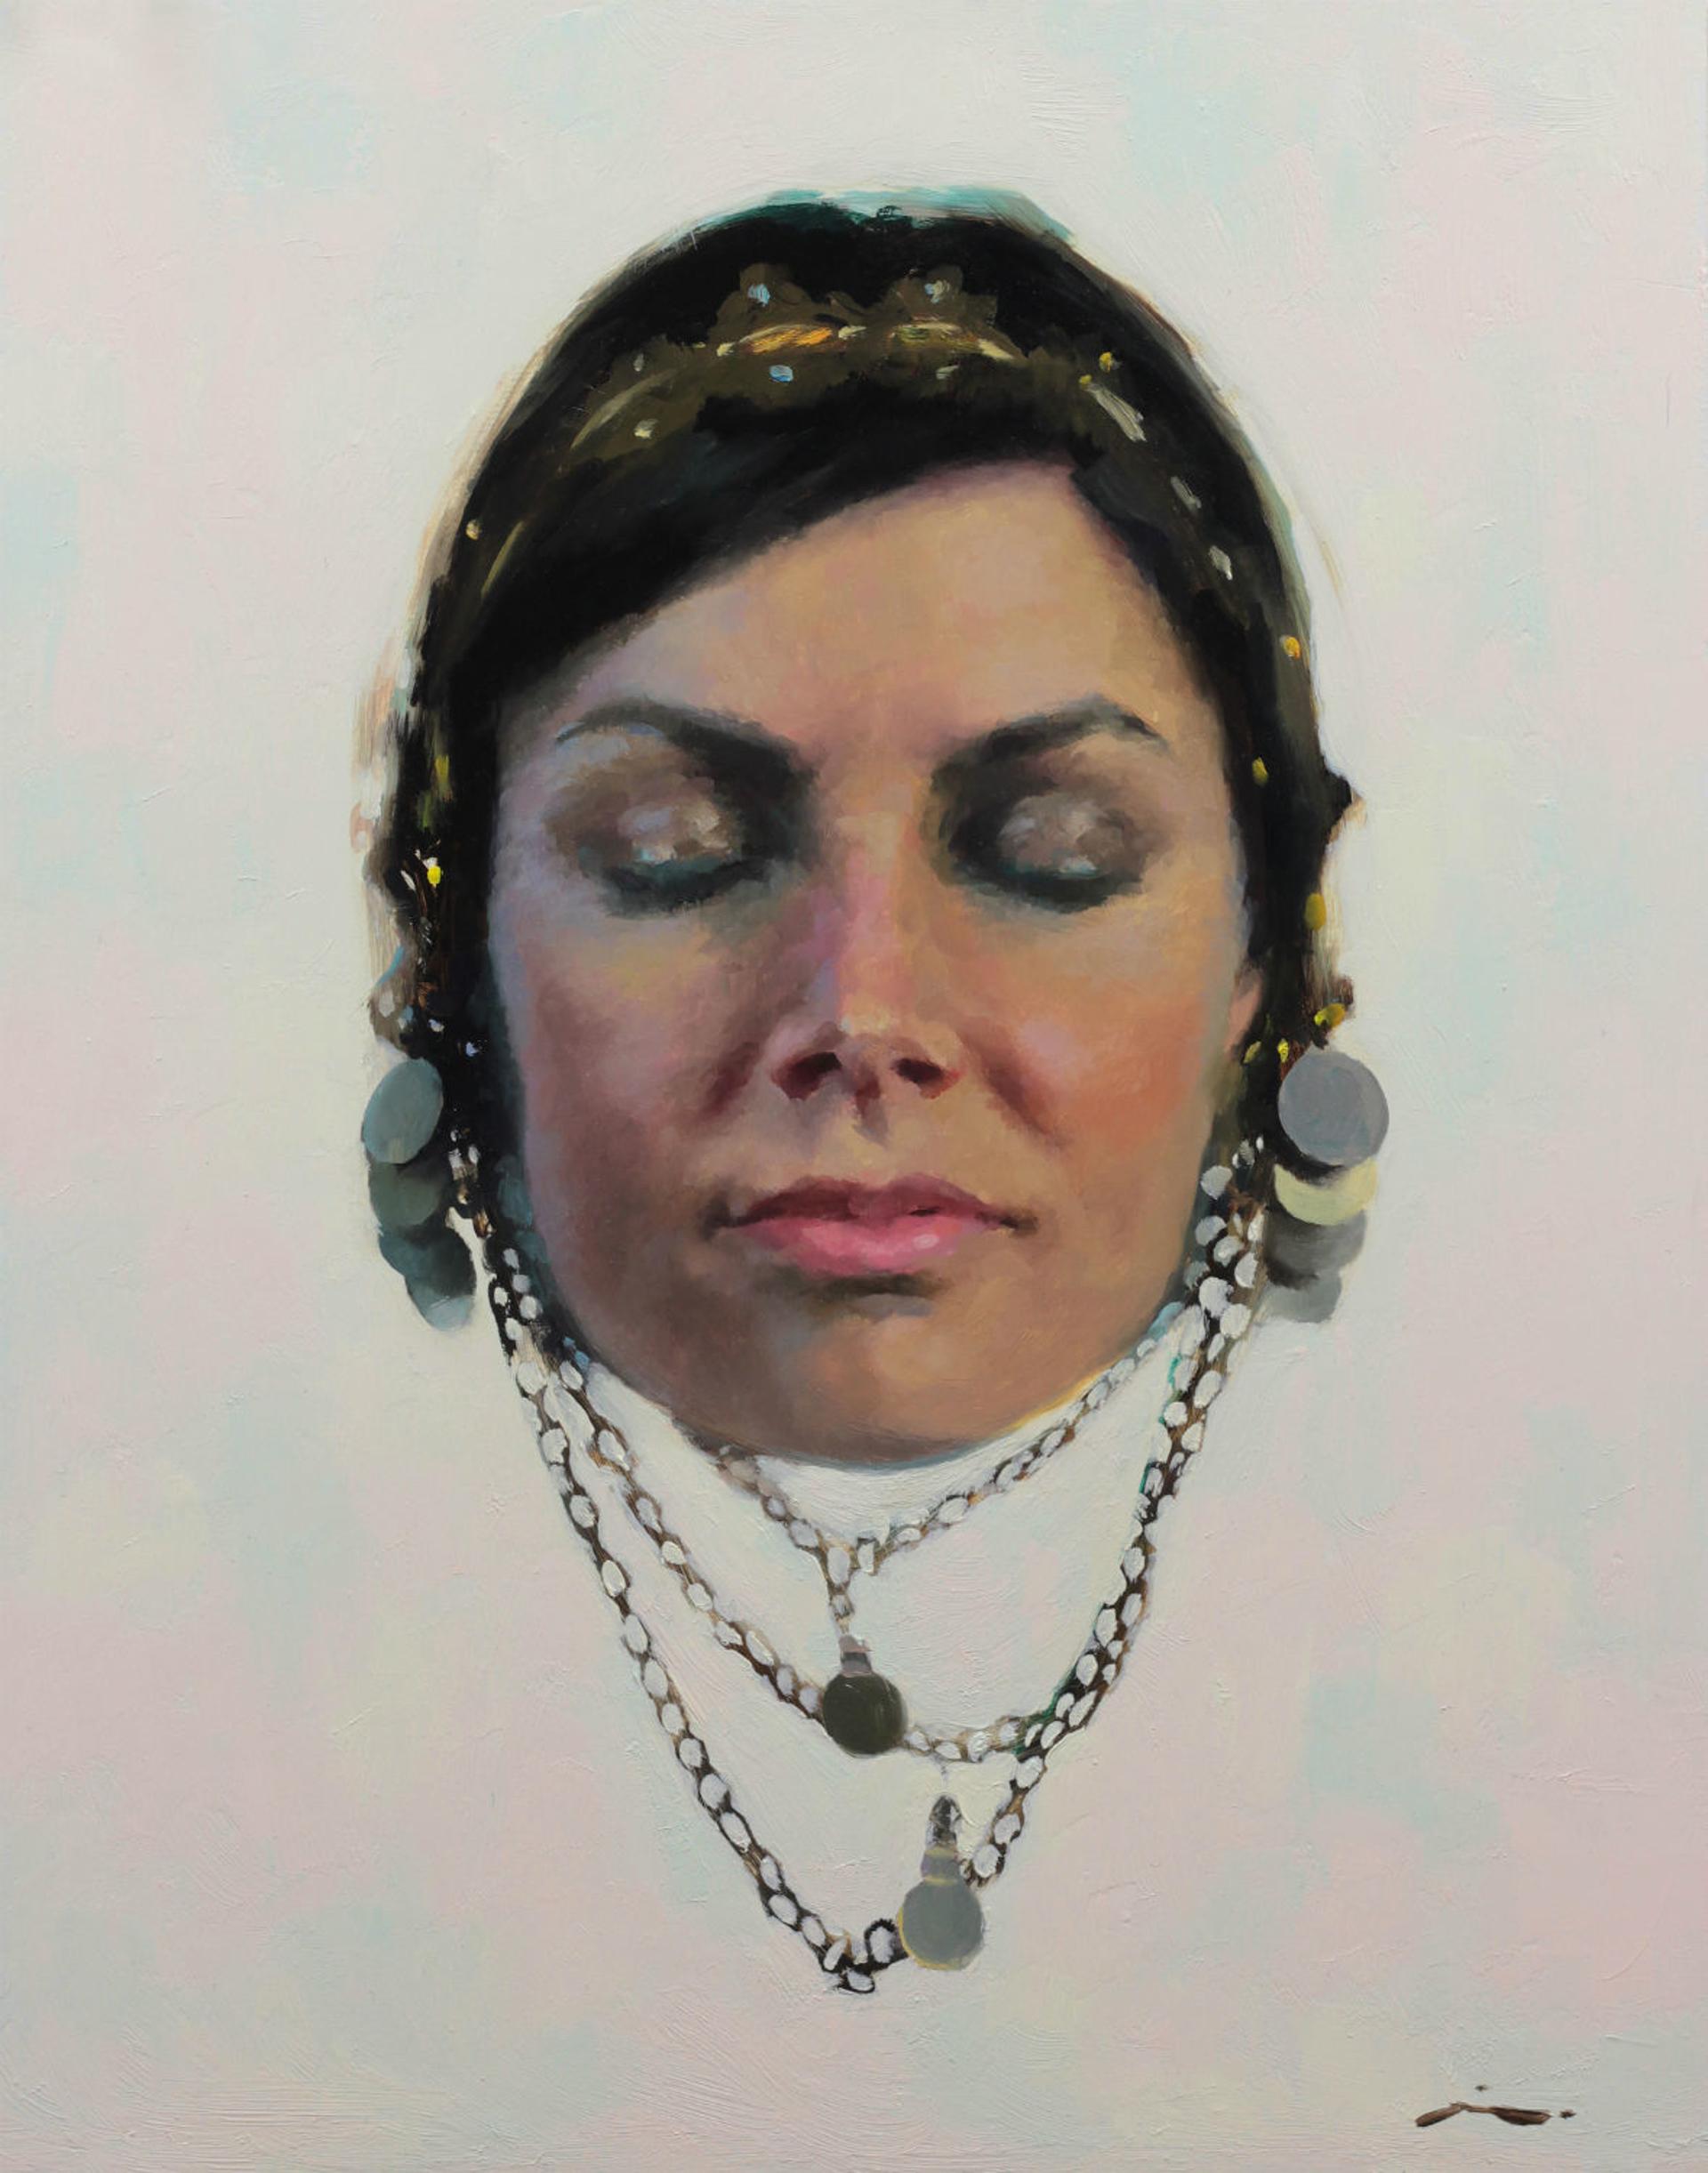 Mask 1 by Mia Bergeron